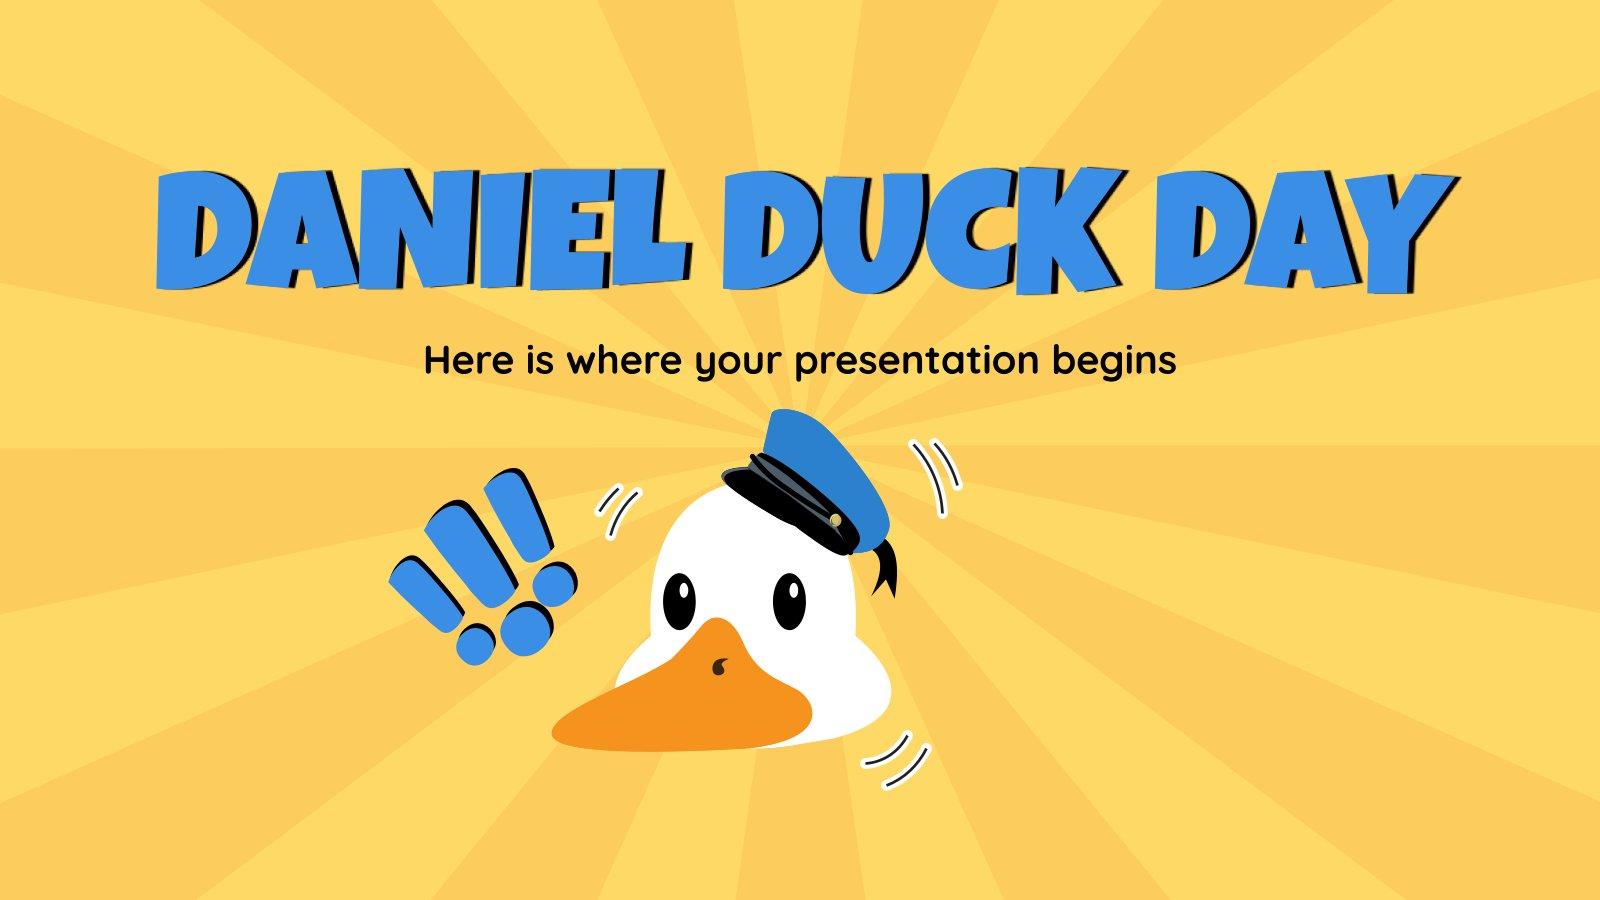 Tag der Ente Daniel Präsentationsvorlage